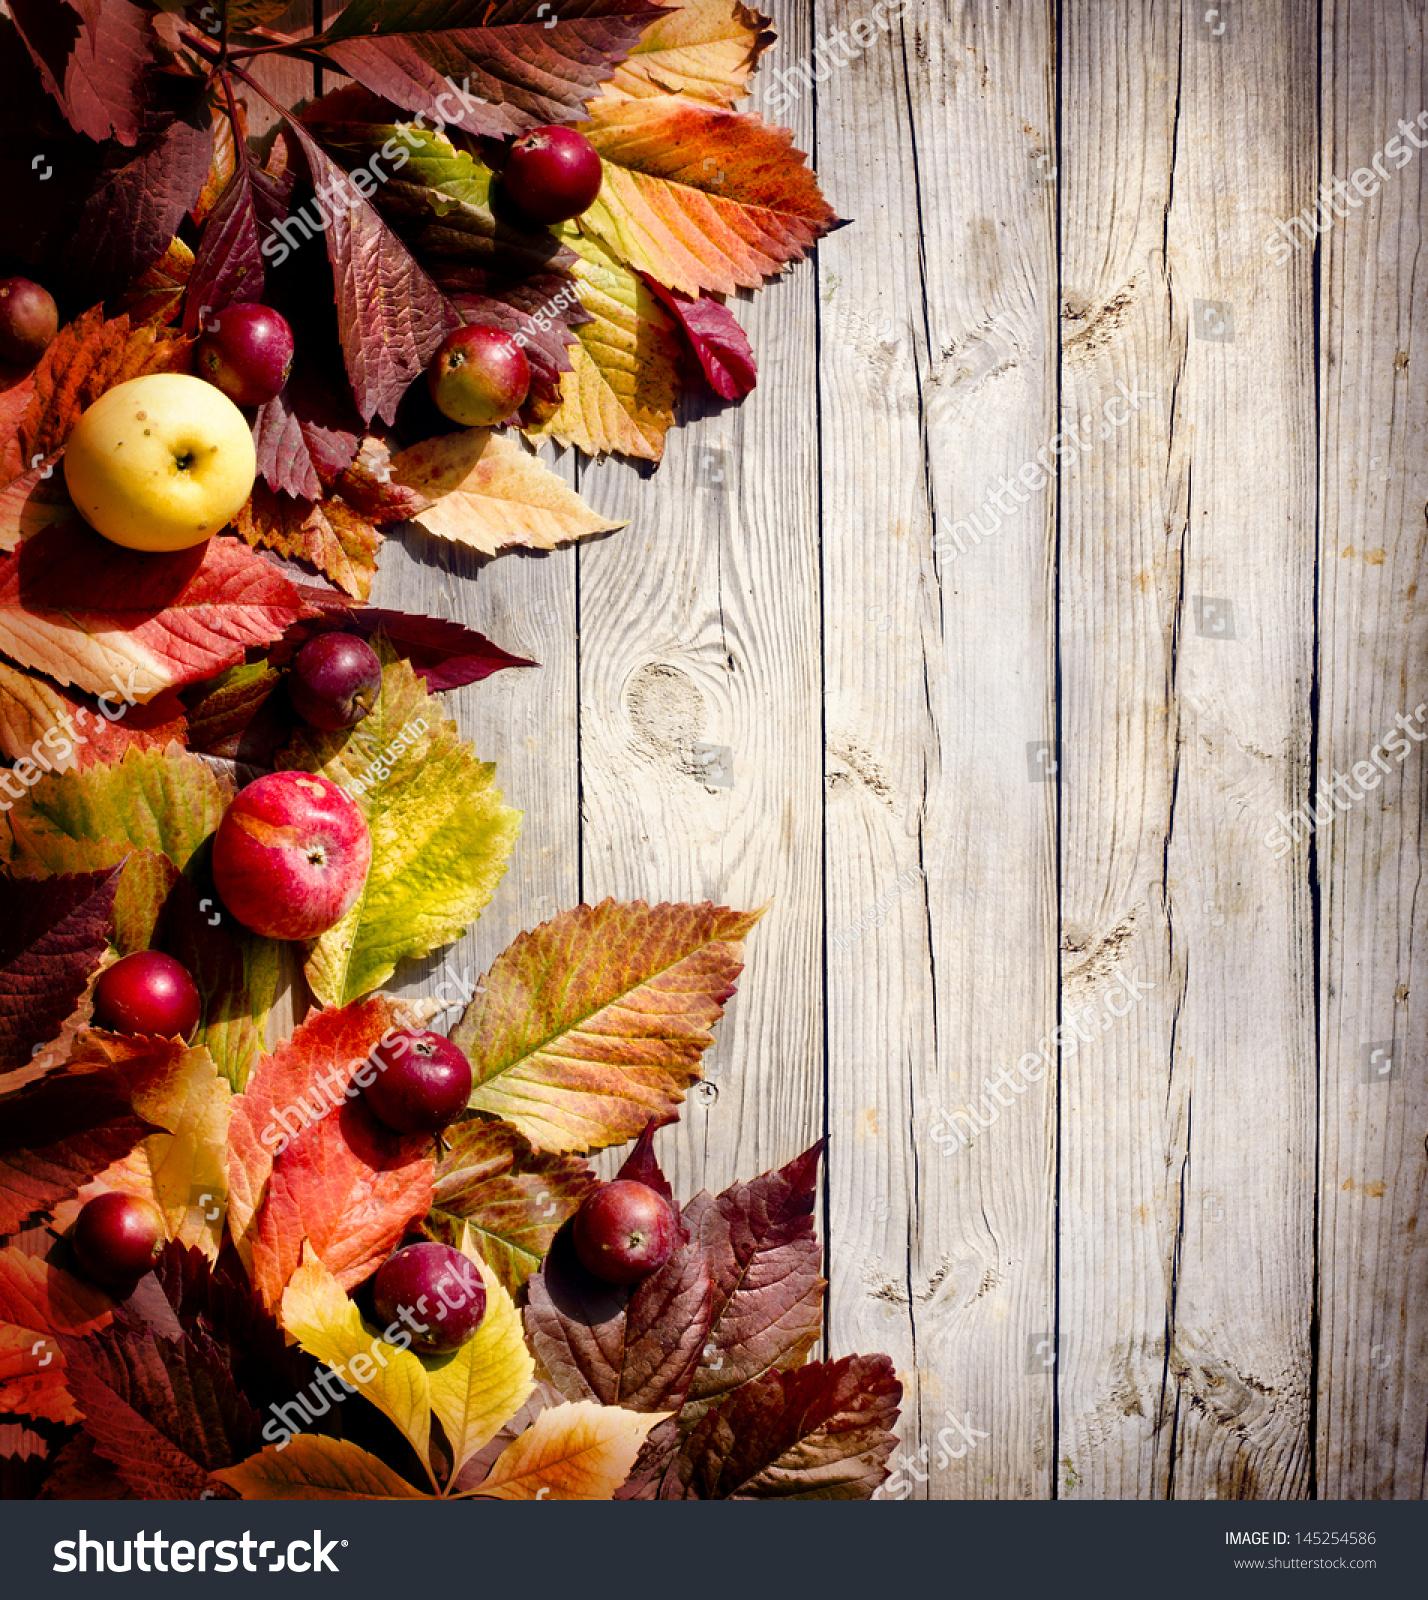 Vintage Autumn Border Apples Fallen Leaves Stock Photo 145254586